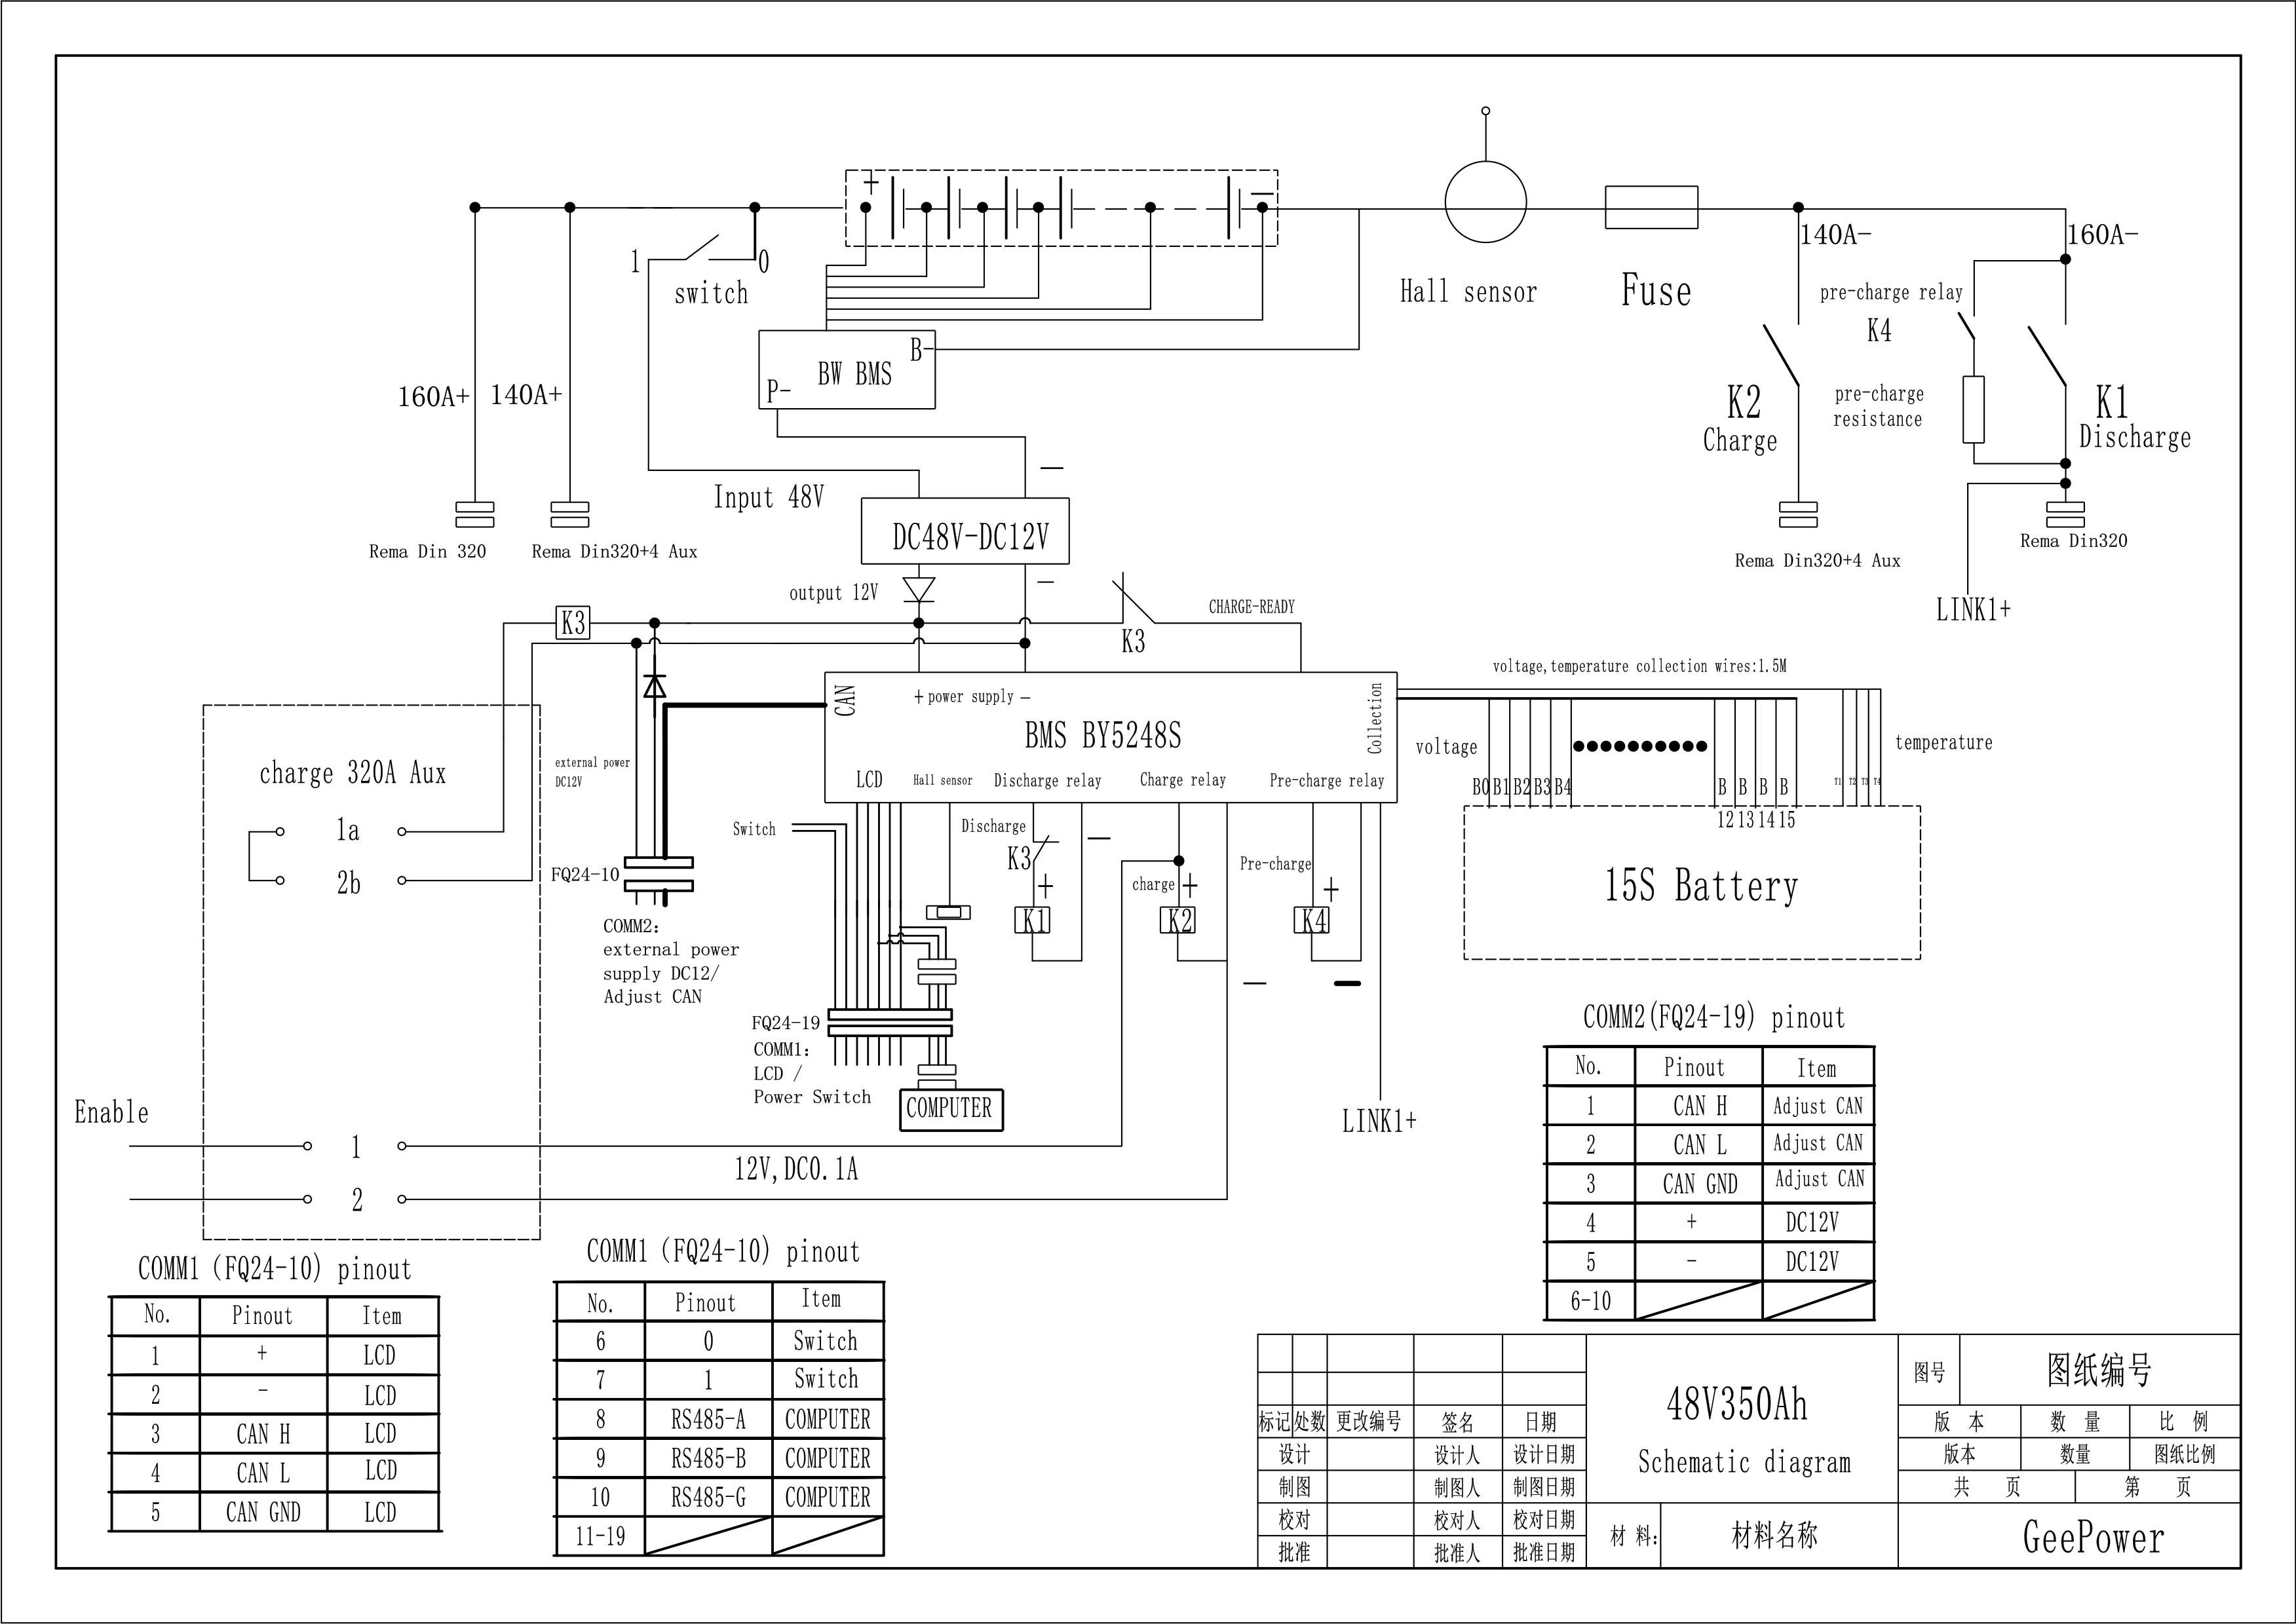 [DIAGRAM_4PO]  HE_0503] Doosan All Schematics Hydraulic Electrical Auto Repair Manual  Moreover Schematic Wiring | Forklift Schematic |  | Minaga Winn Papxe Mohammedshrine Librar Wiring 101